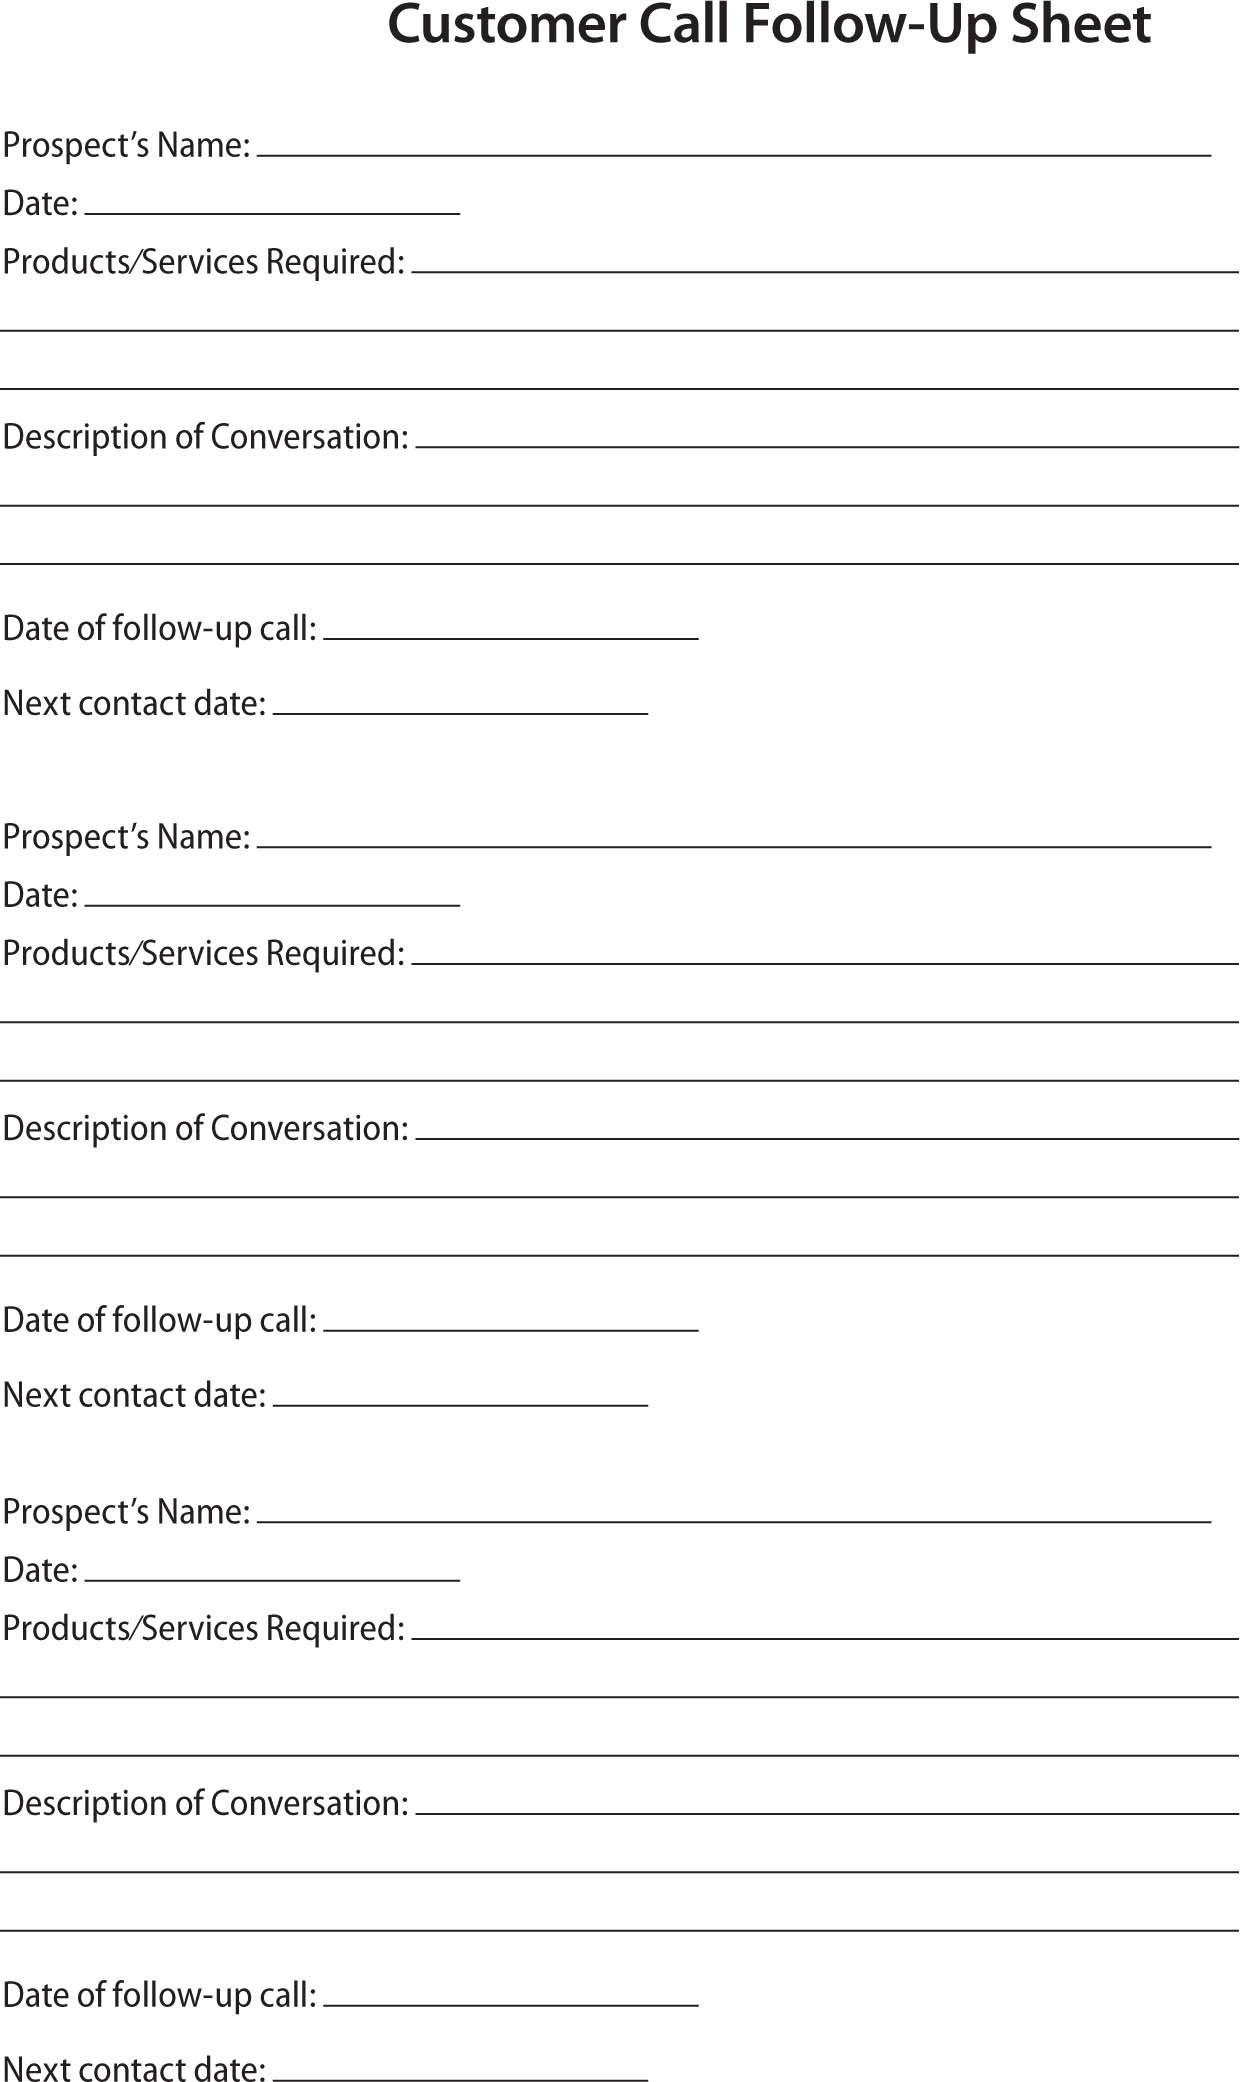 80 20 Prospect Sheet Customer Call Follow Up   Call Sheet - Free Printable Salon Sign In Sheets